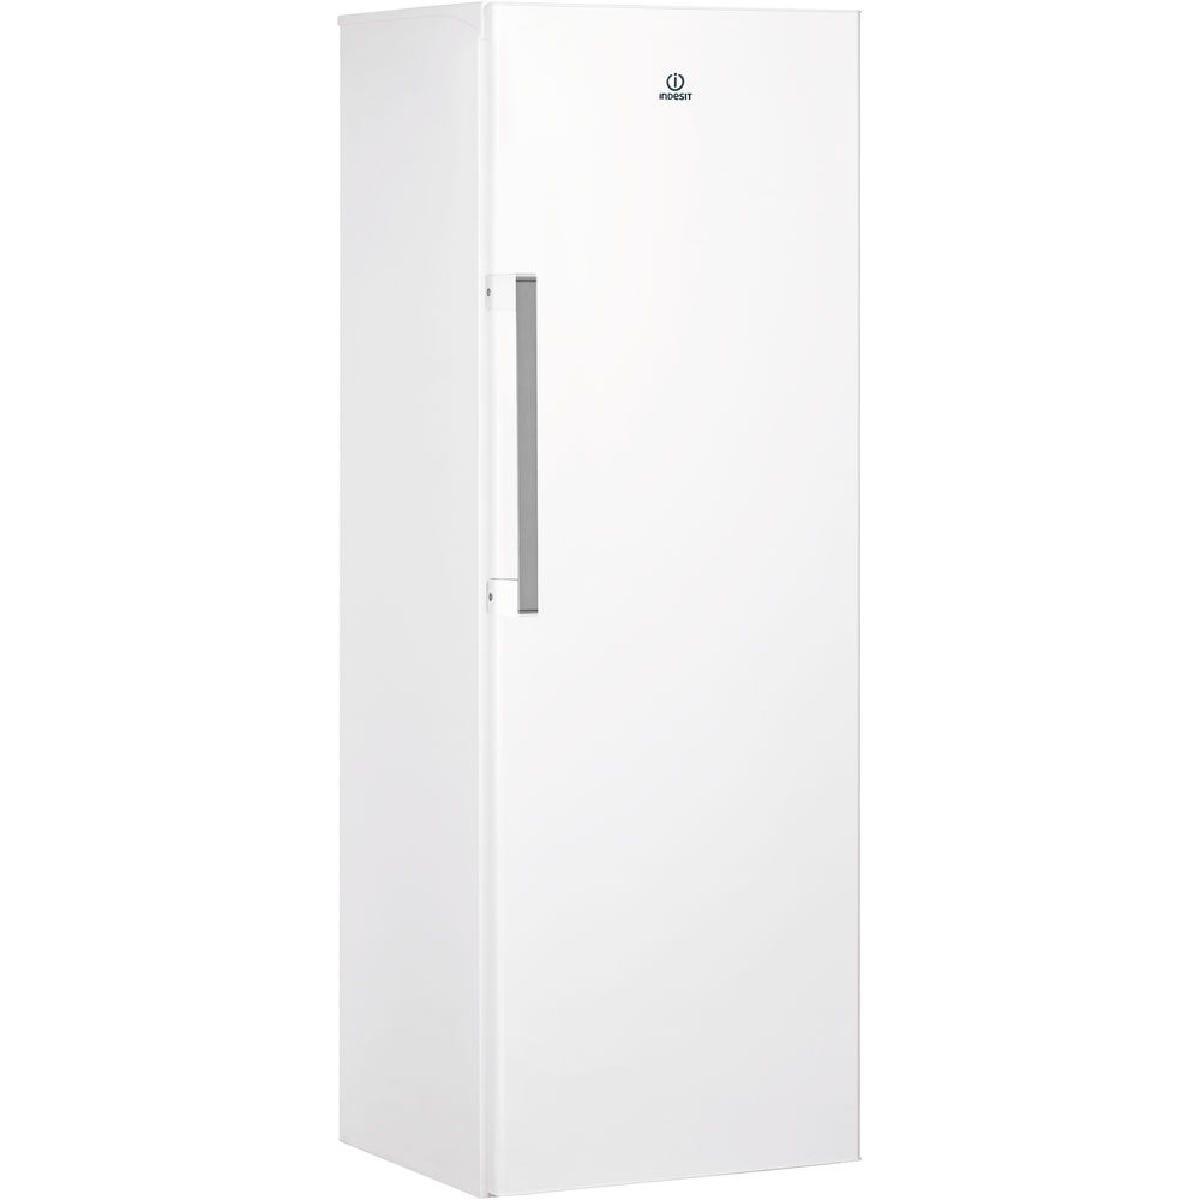 indesit si8 1q wd.1 fridge - white